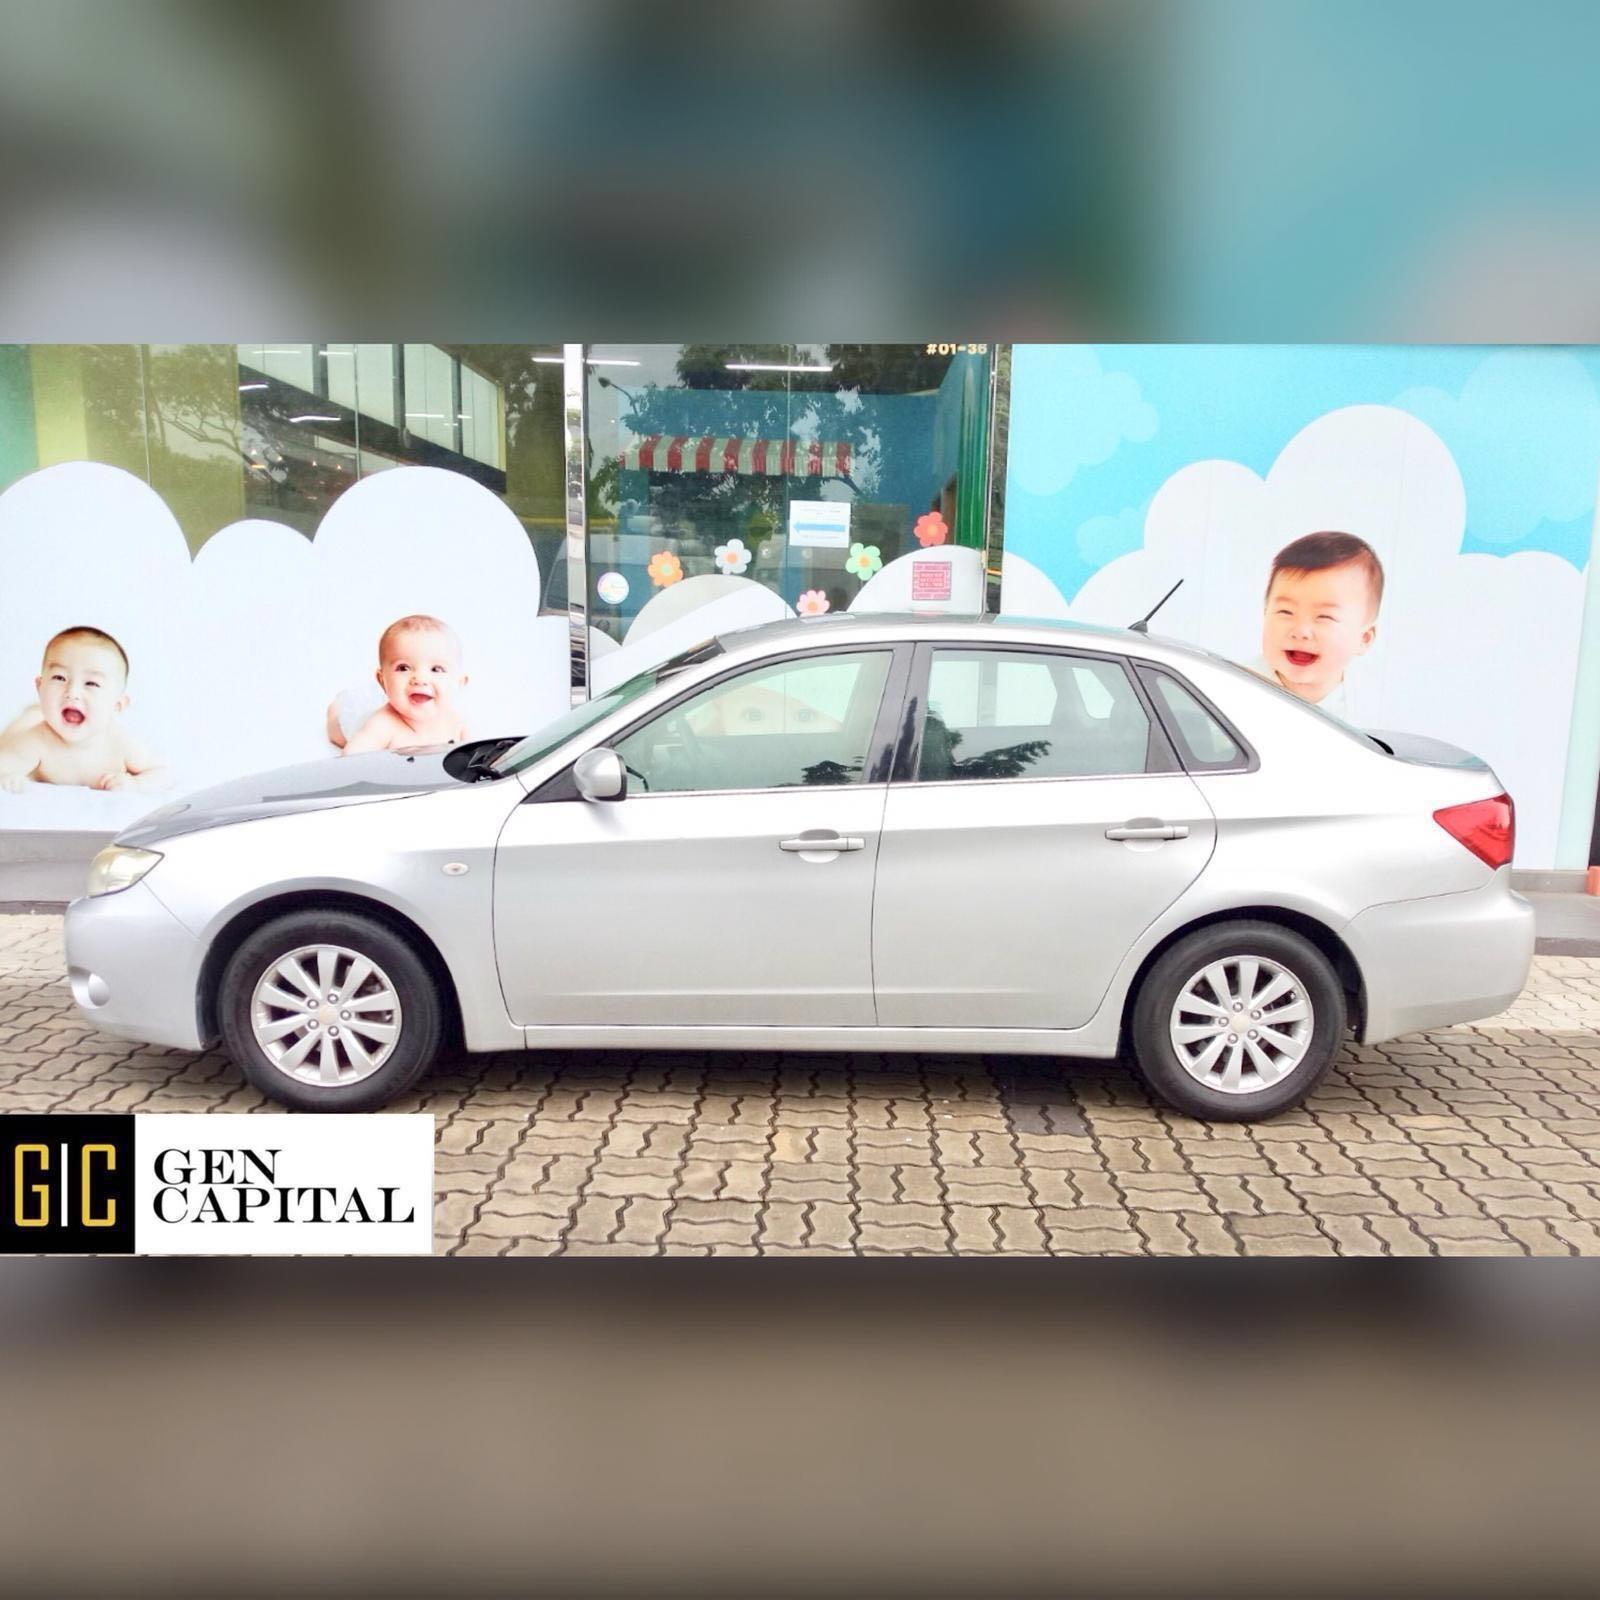 Subaru Impreza 1.5a Sedan Grab Gojek Ryde Tada & Non PHV Car Rental Services in Singapore!